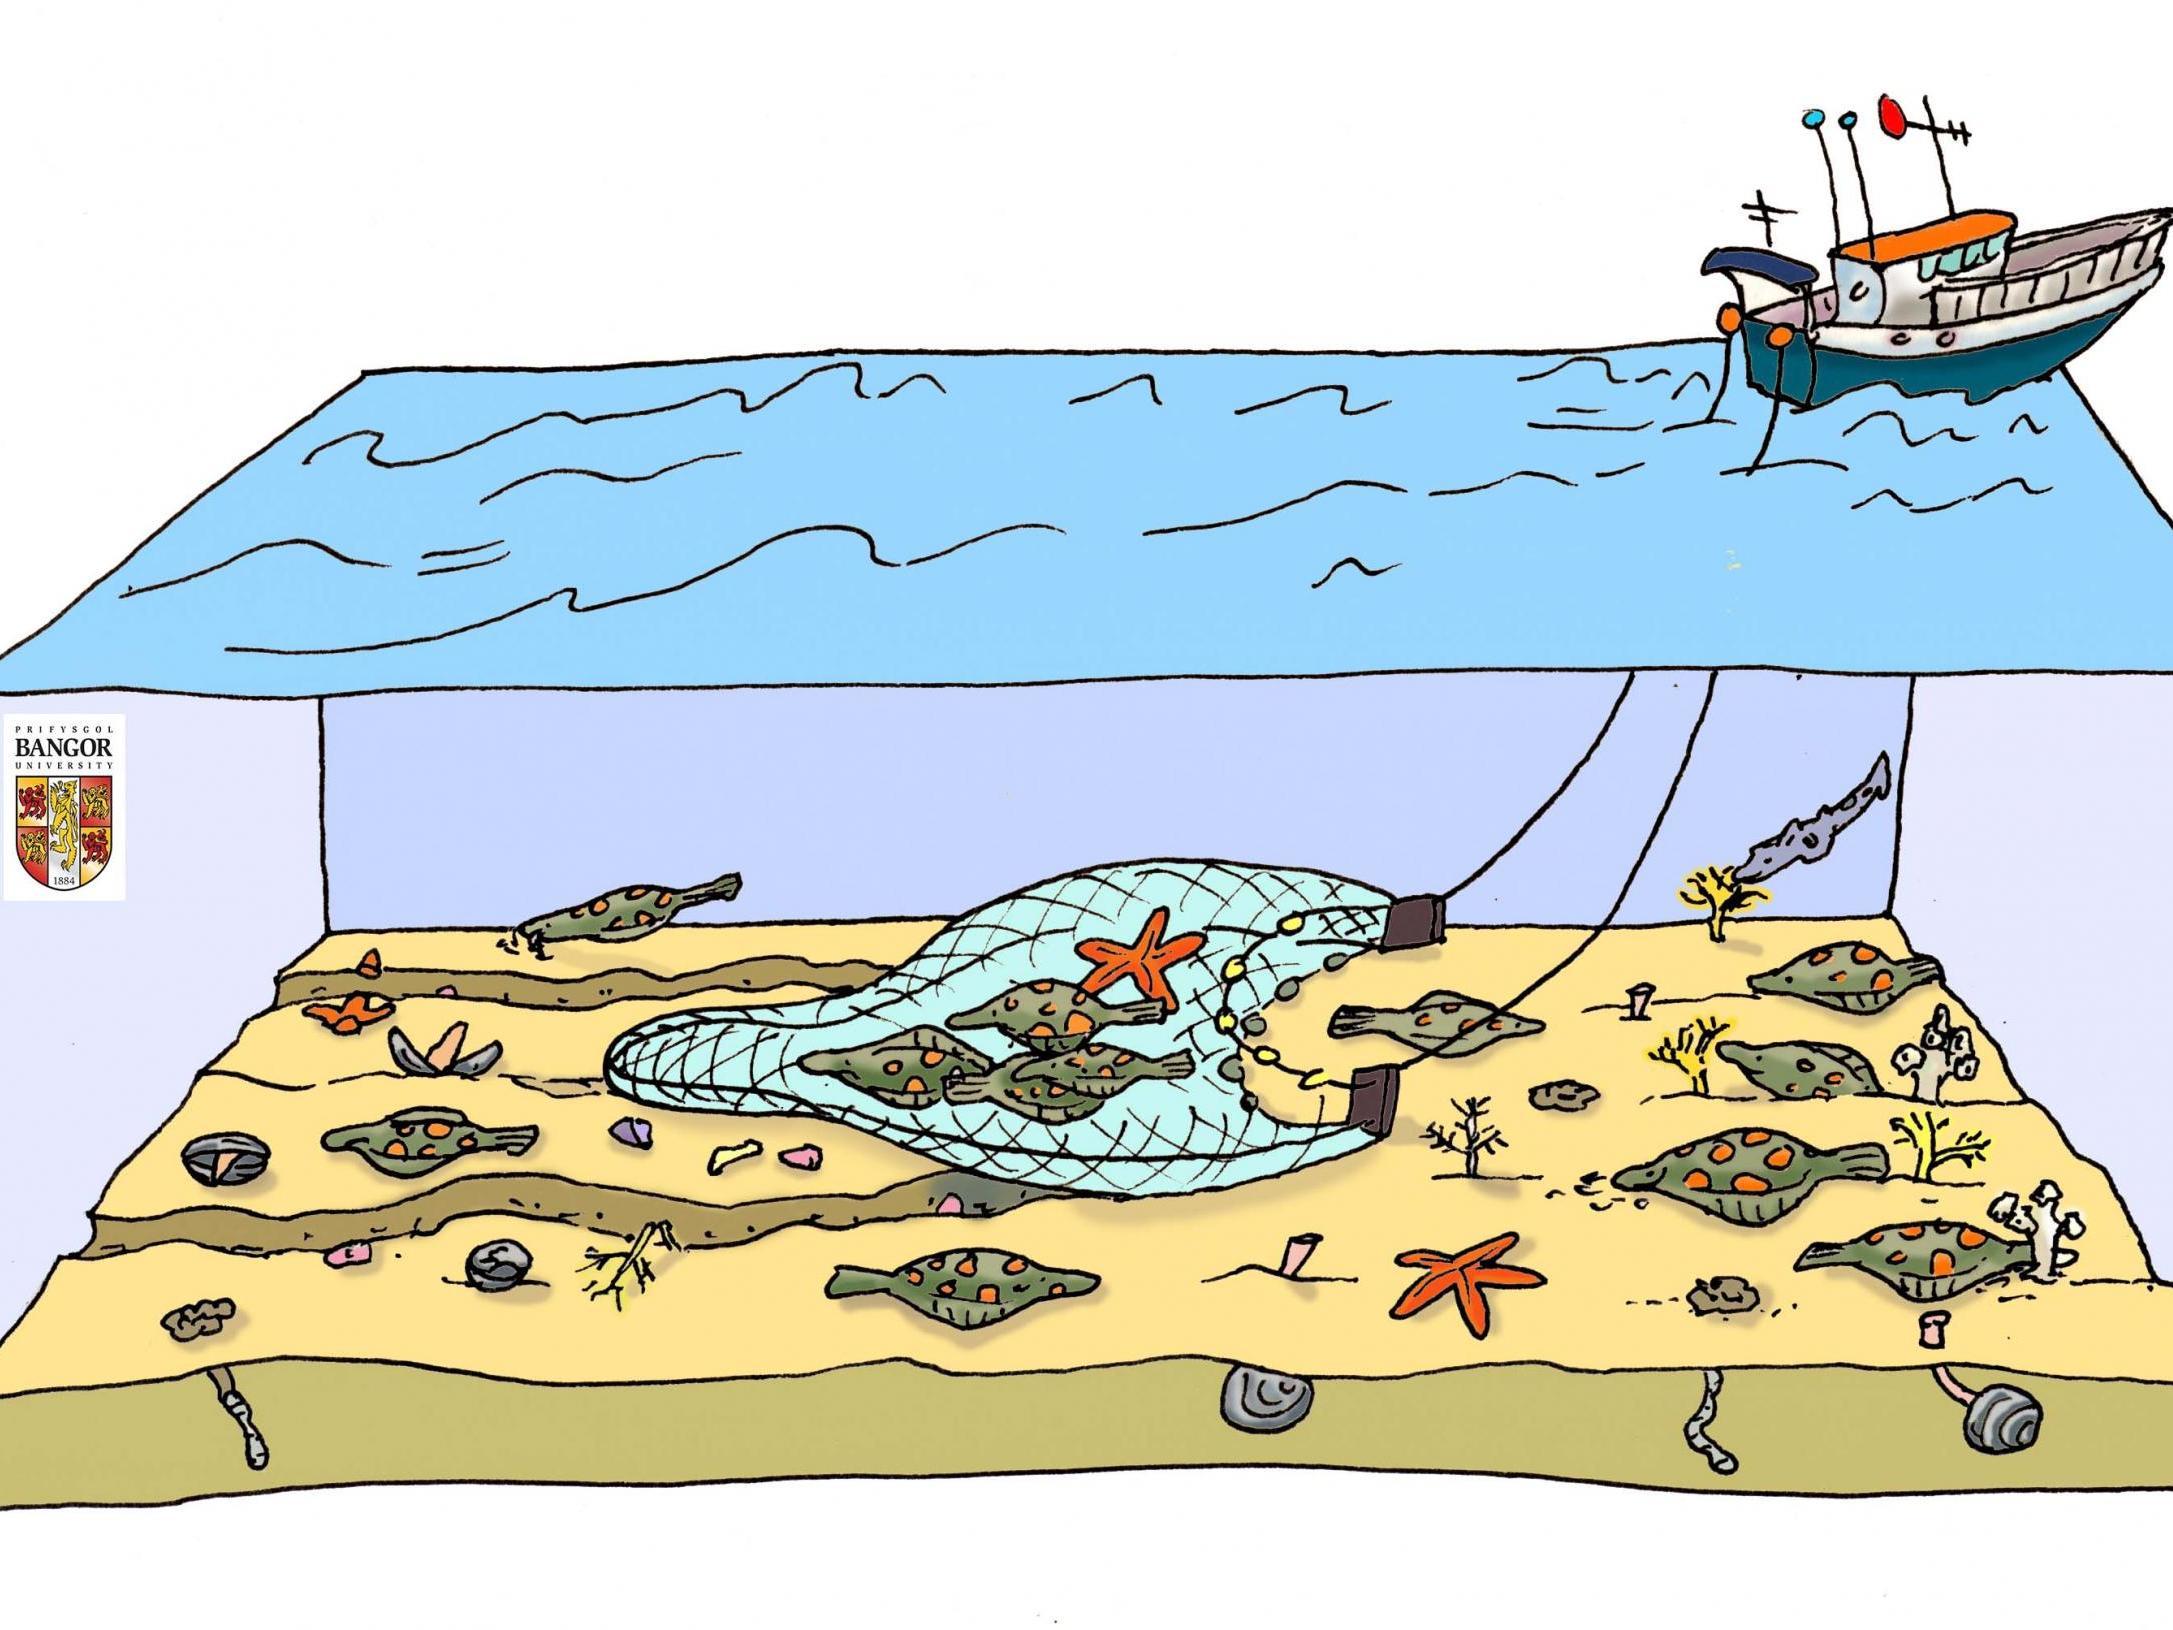 Quarter of world's seafood caught using destructive bottom-trawling